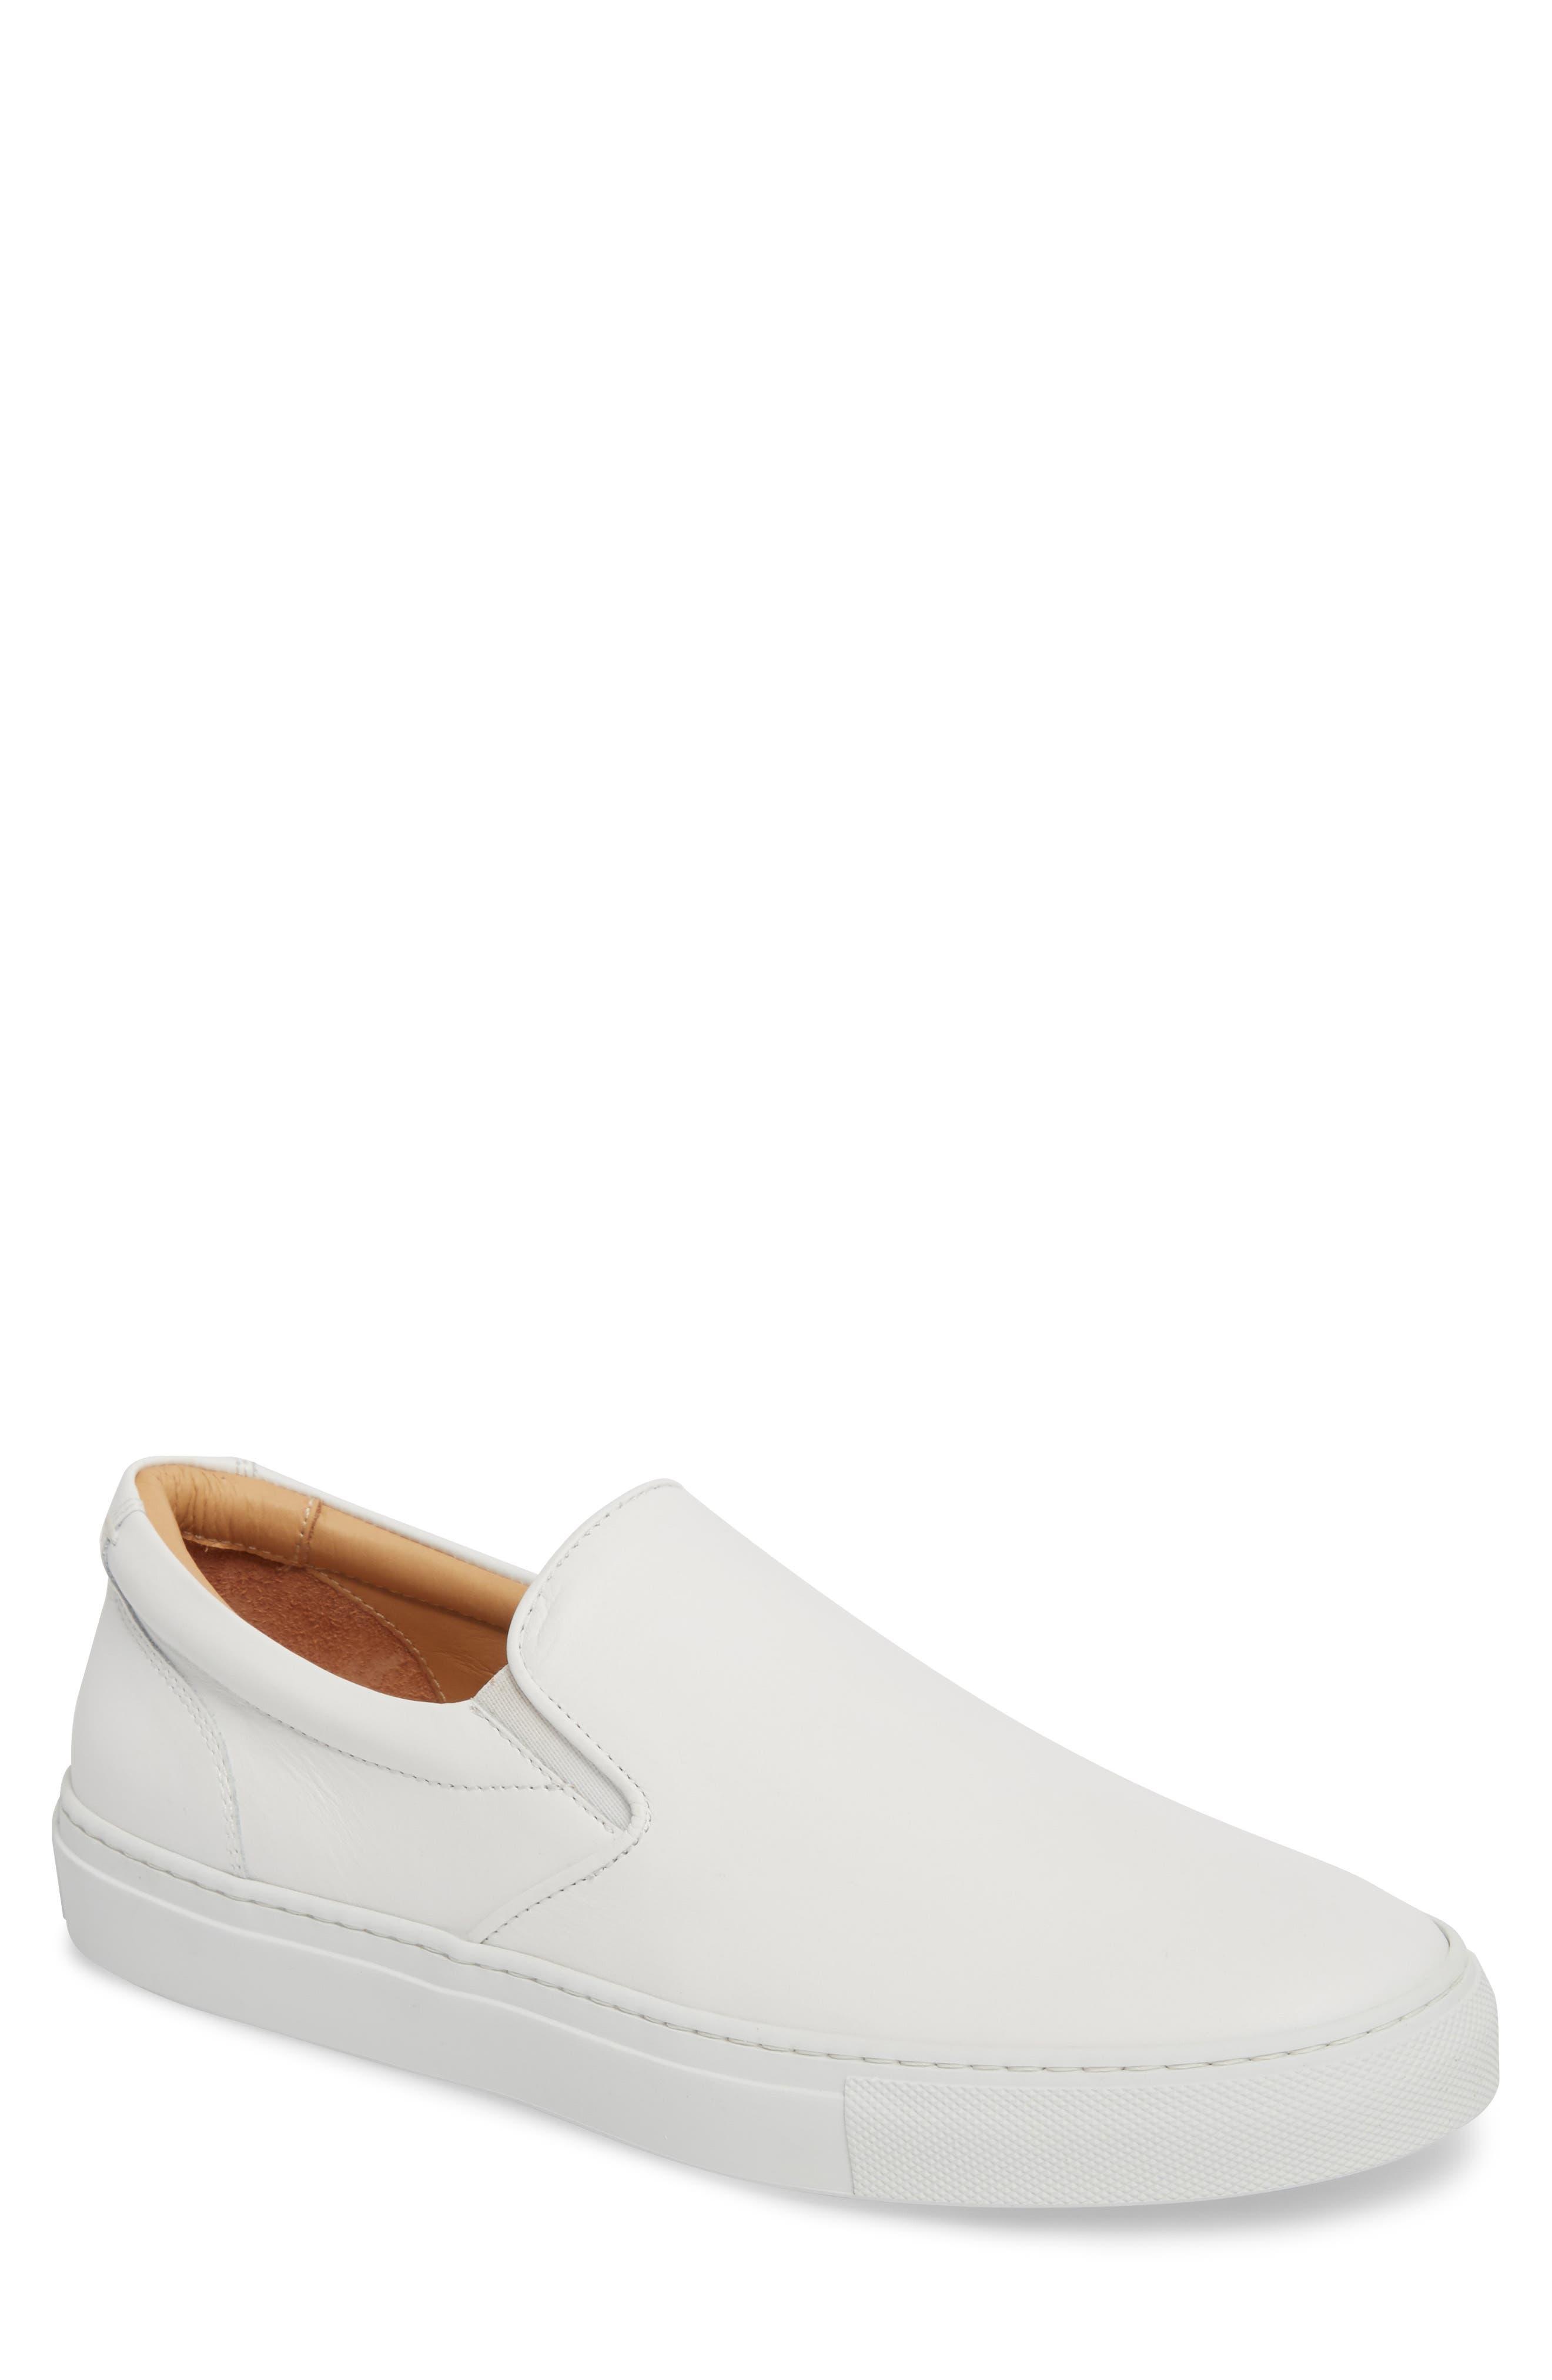 Greats Wooster Slip-On Sneaker, White